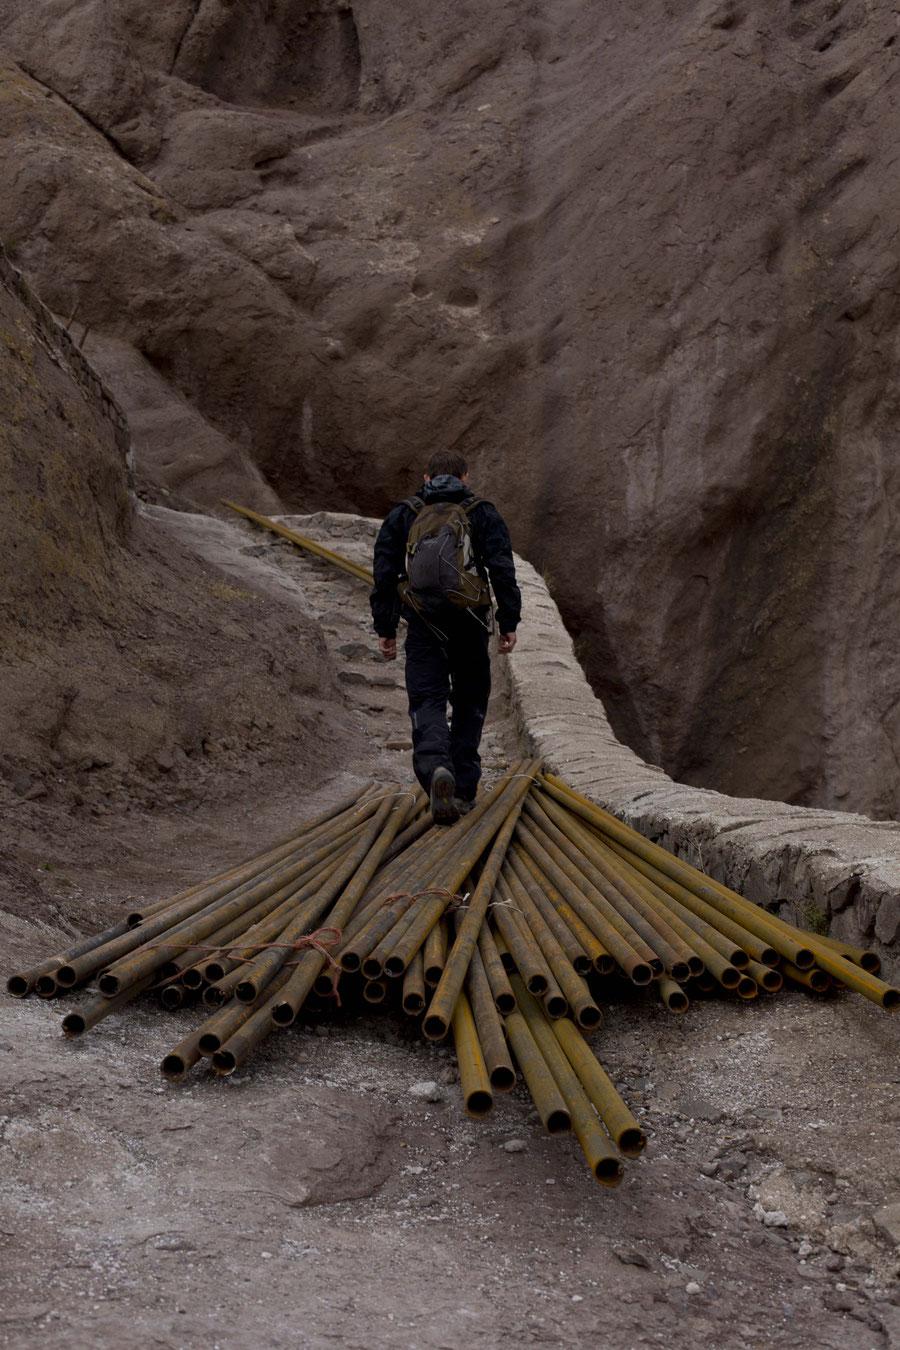 J.'s suche nach Herausforderung, Alamut, Qazvin, Iran